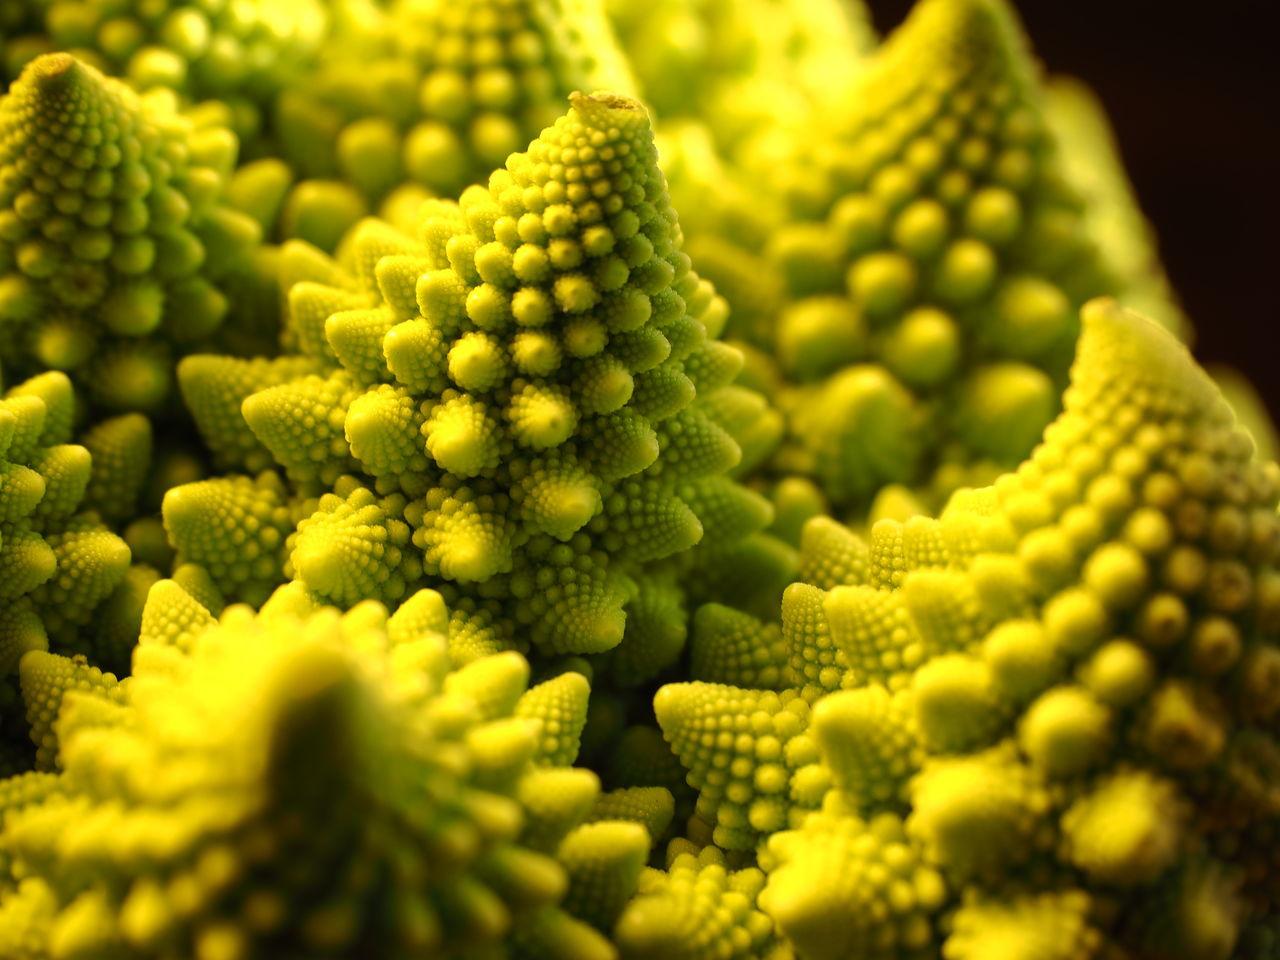 Close-up of romanesco cauliflower